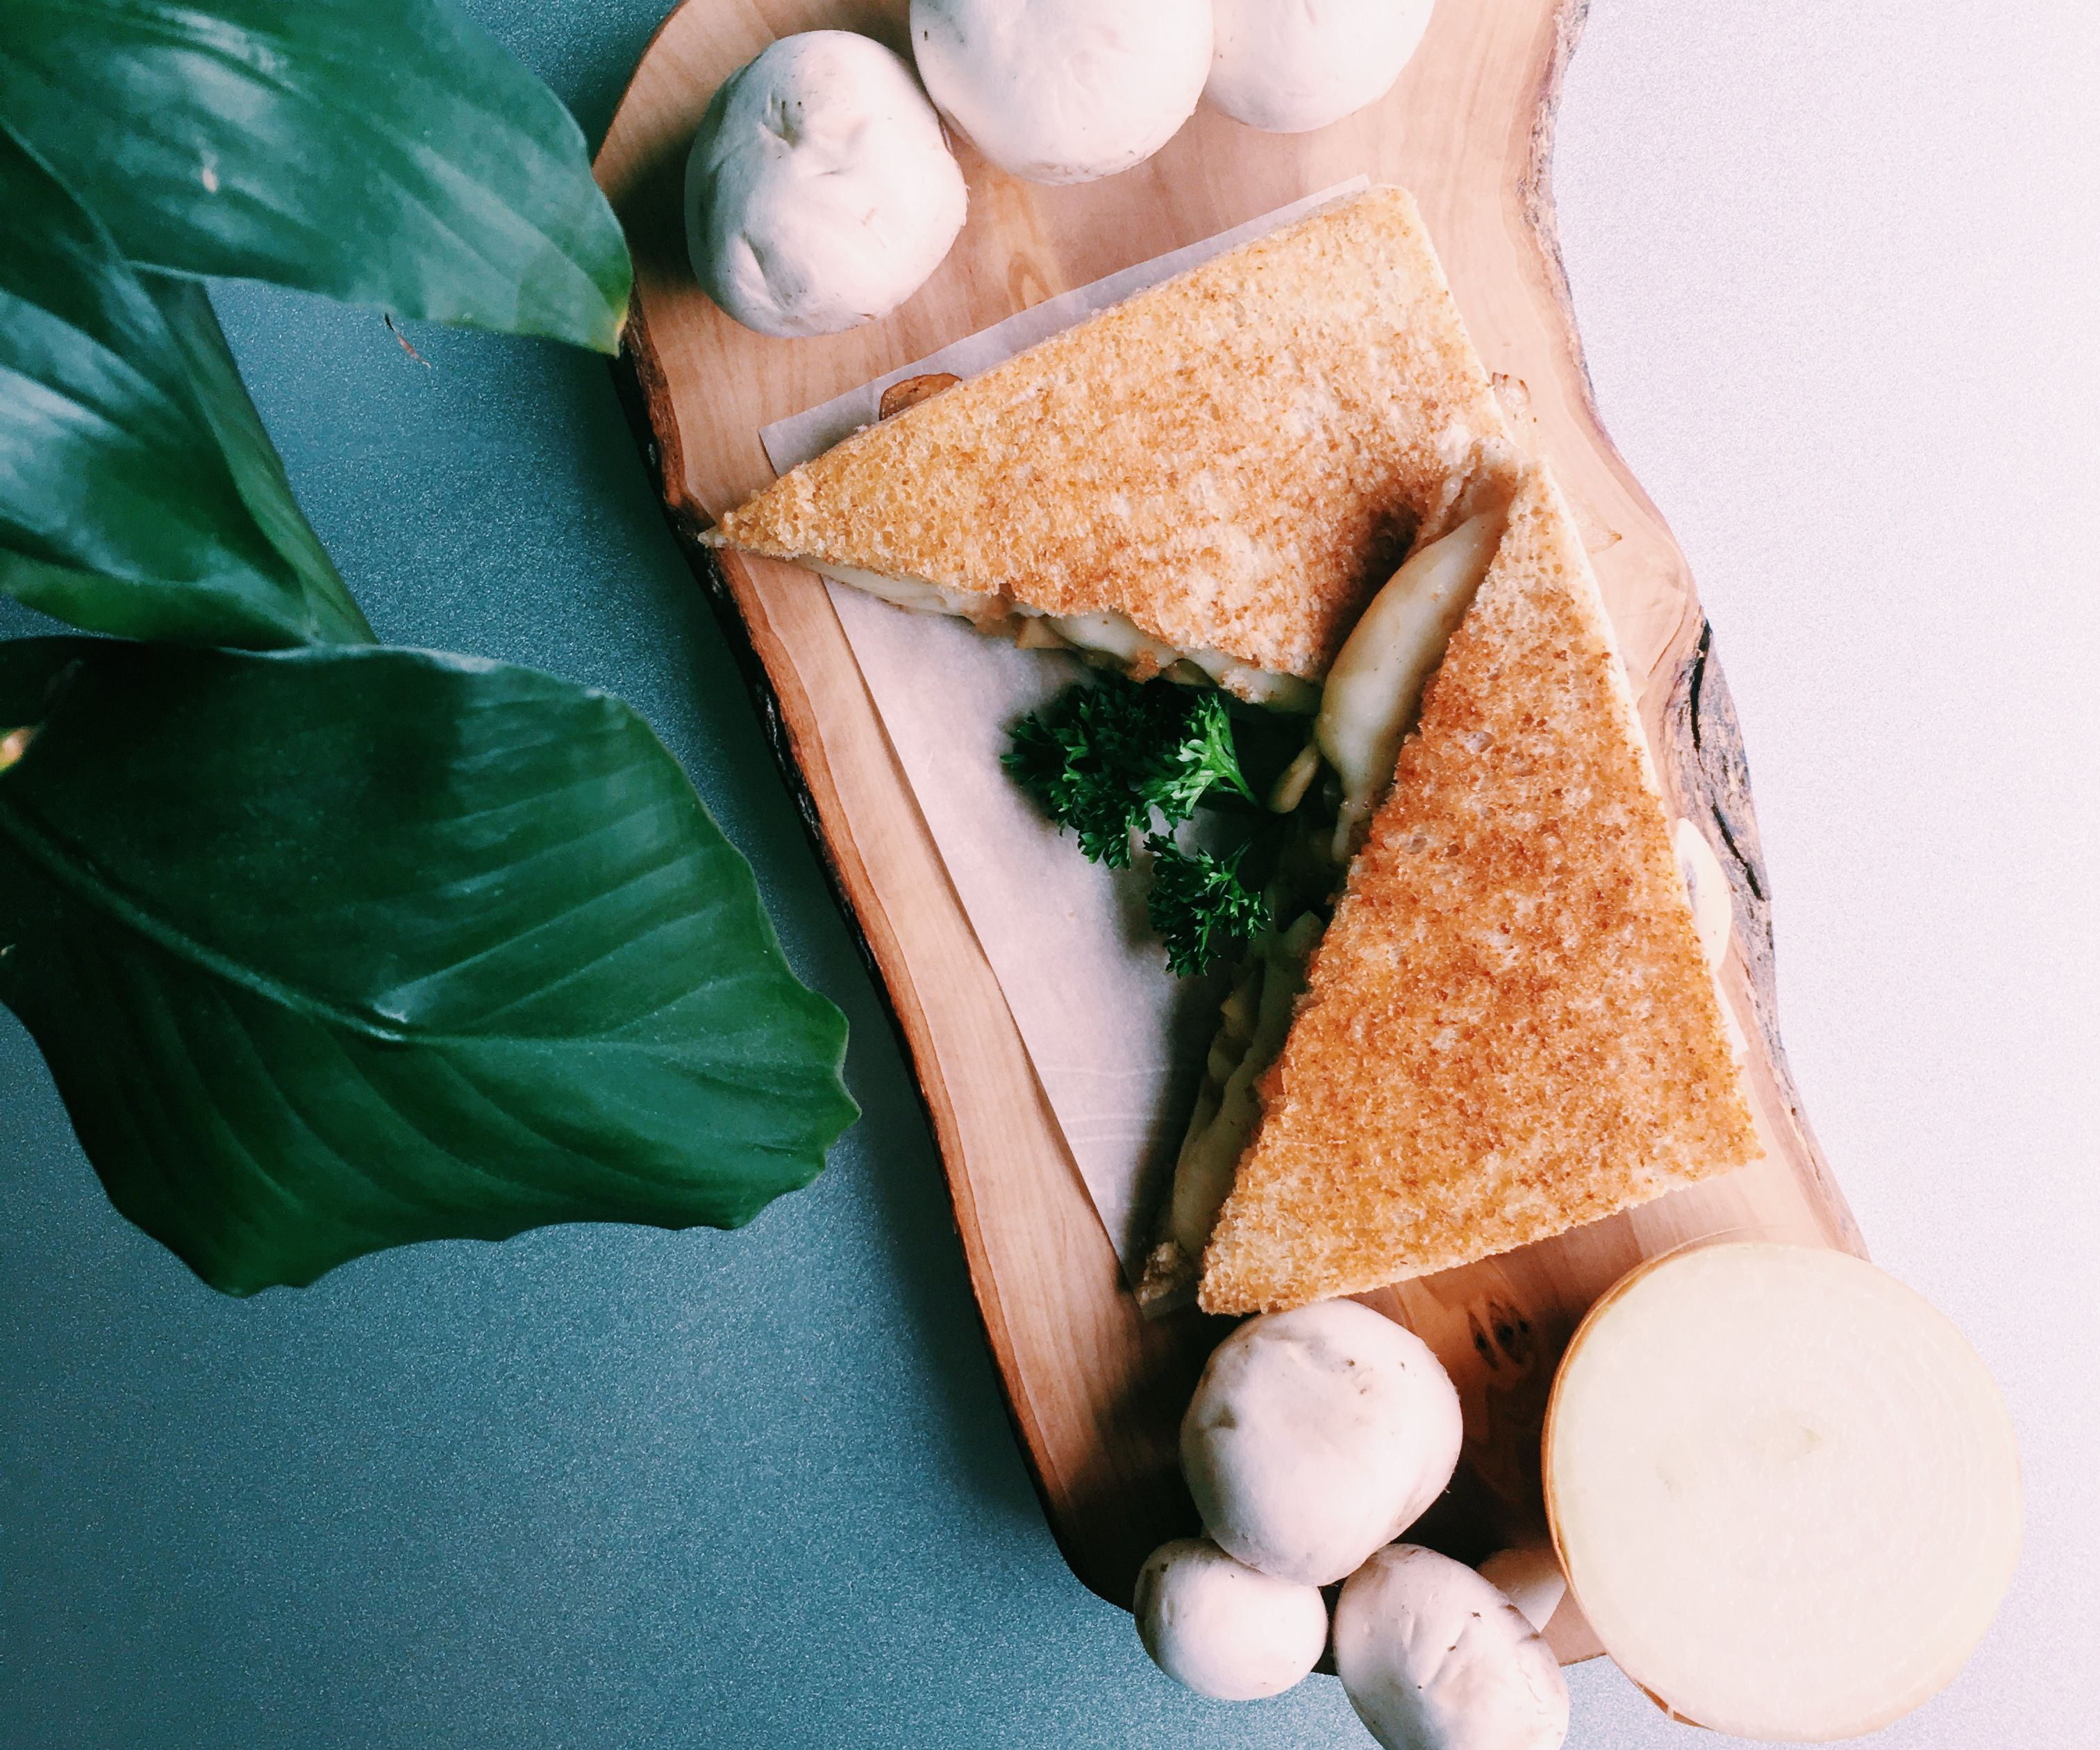 RECIPE | GRILLED MUSHROOM CHEESE SANDWICH